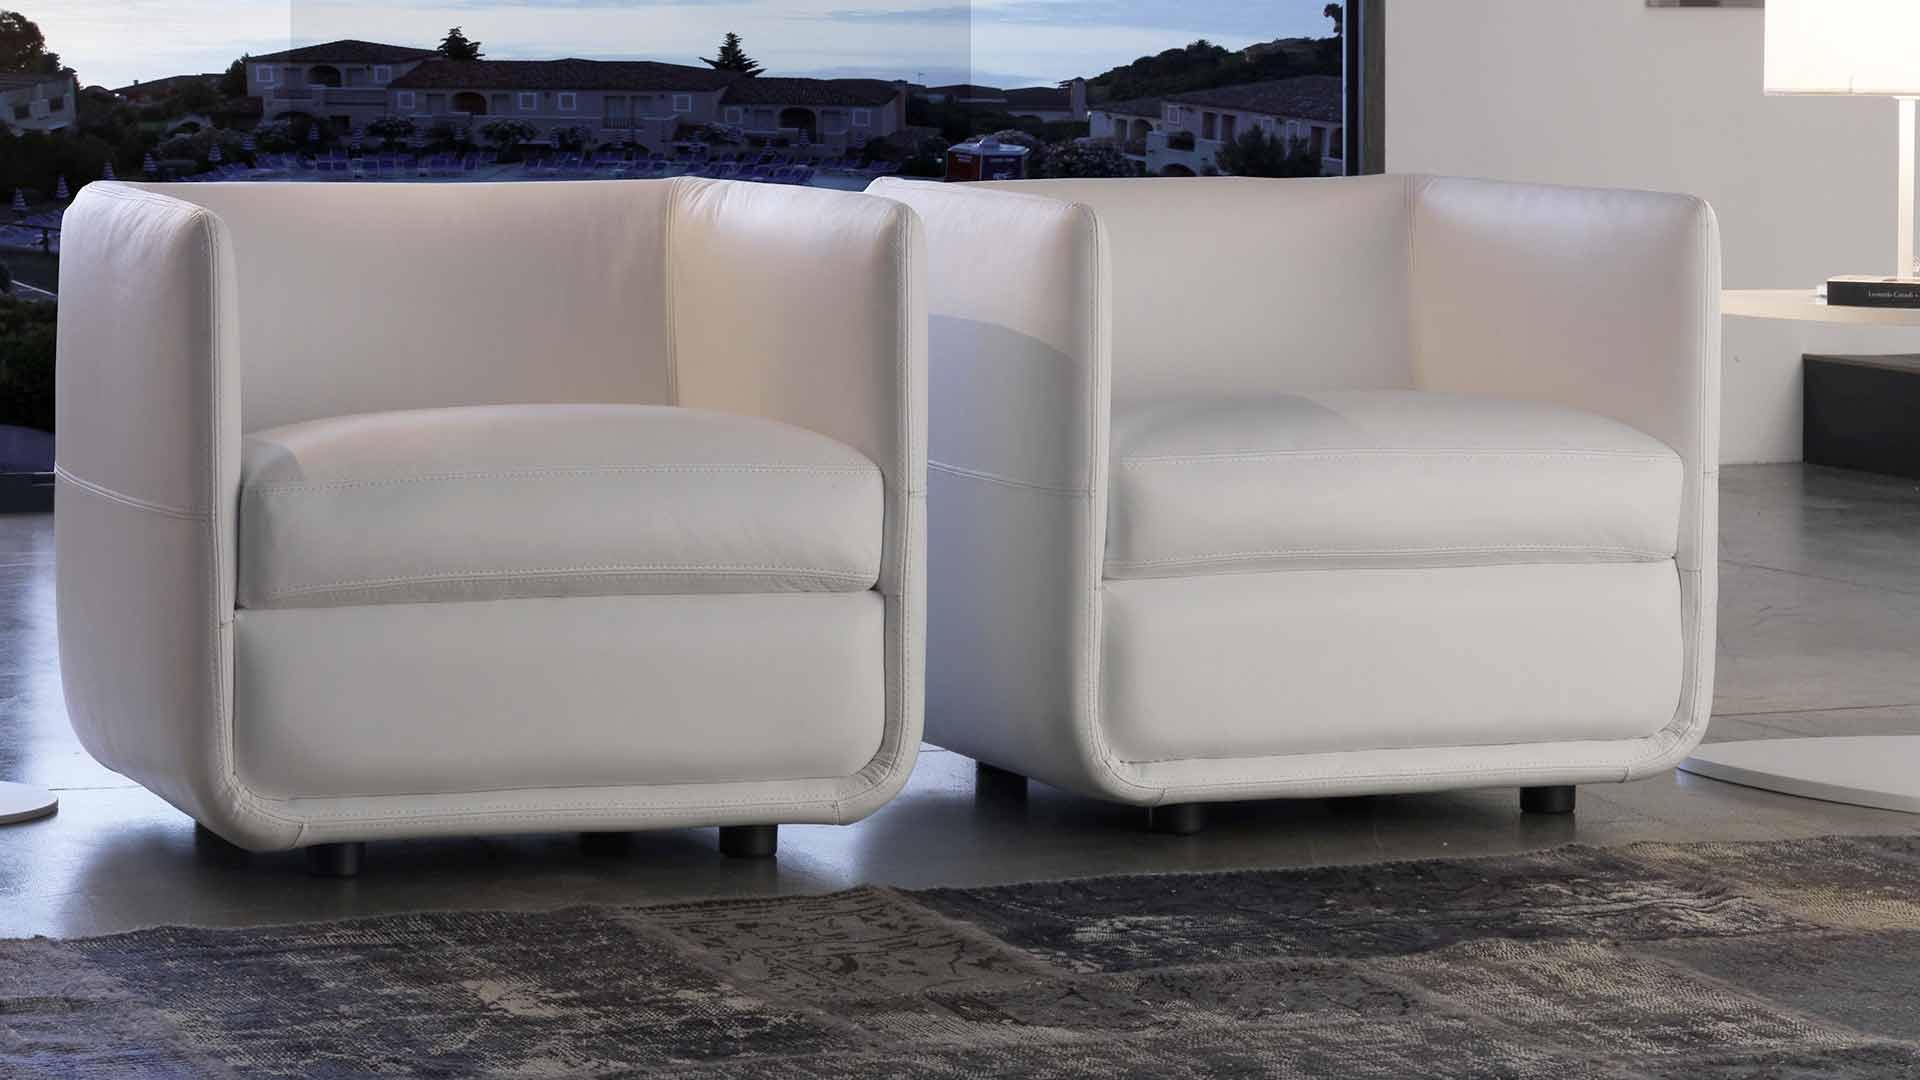 Chateau d'ax italia is a leading manufacturer of upholstery furniture since 1948. Chateau D Ax Catalogo 2021 Stile Qualita E Comfort